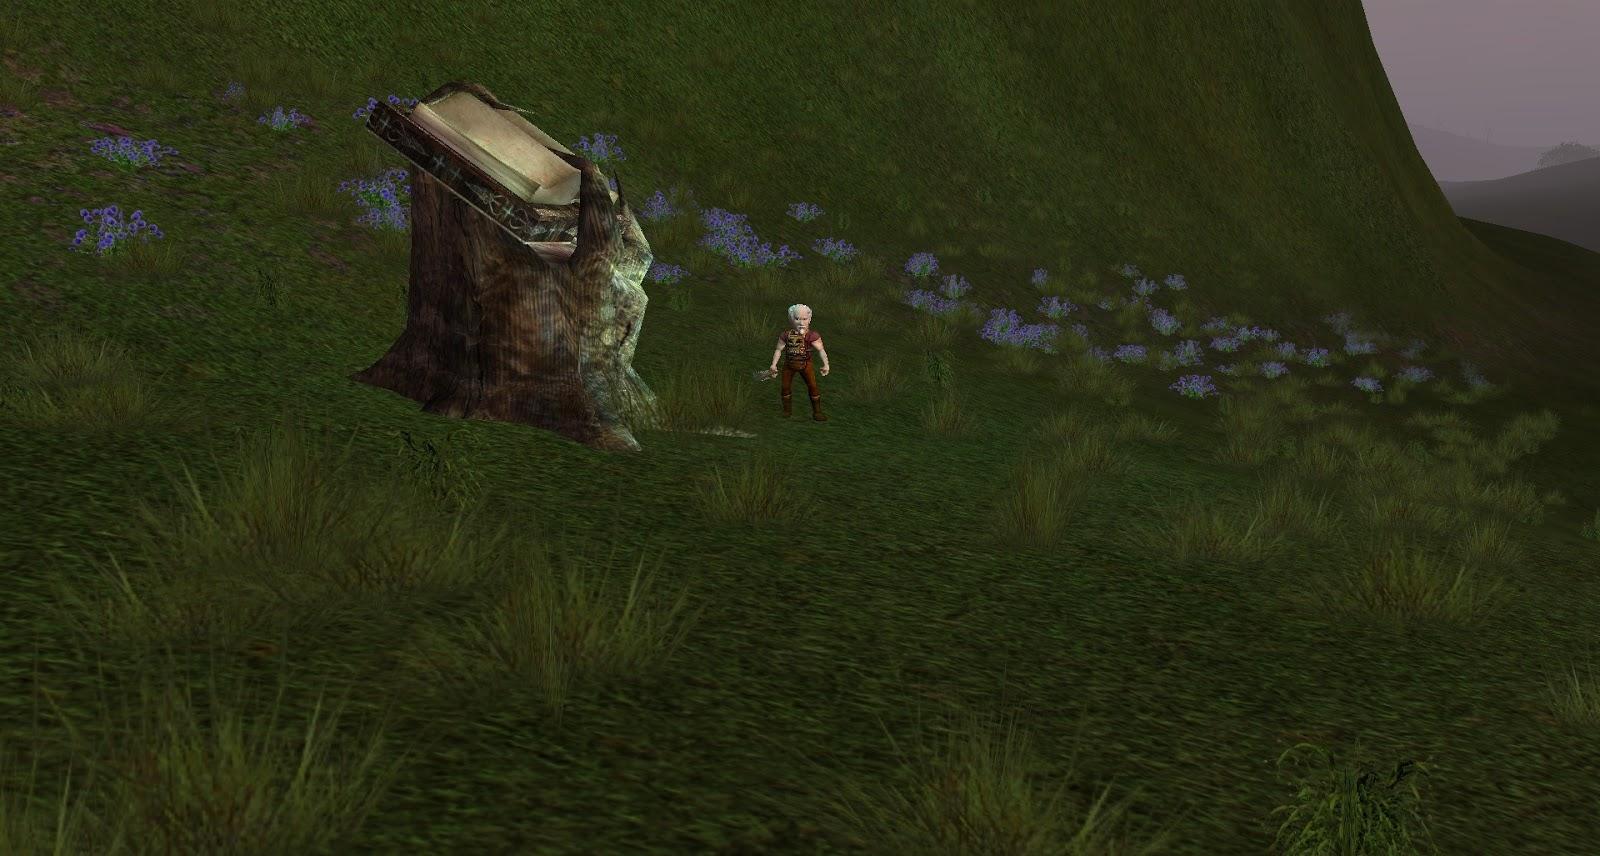 Inventory Full: Call That Progress? : EverQuest